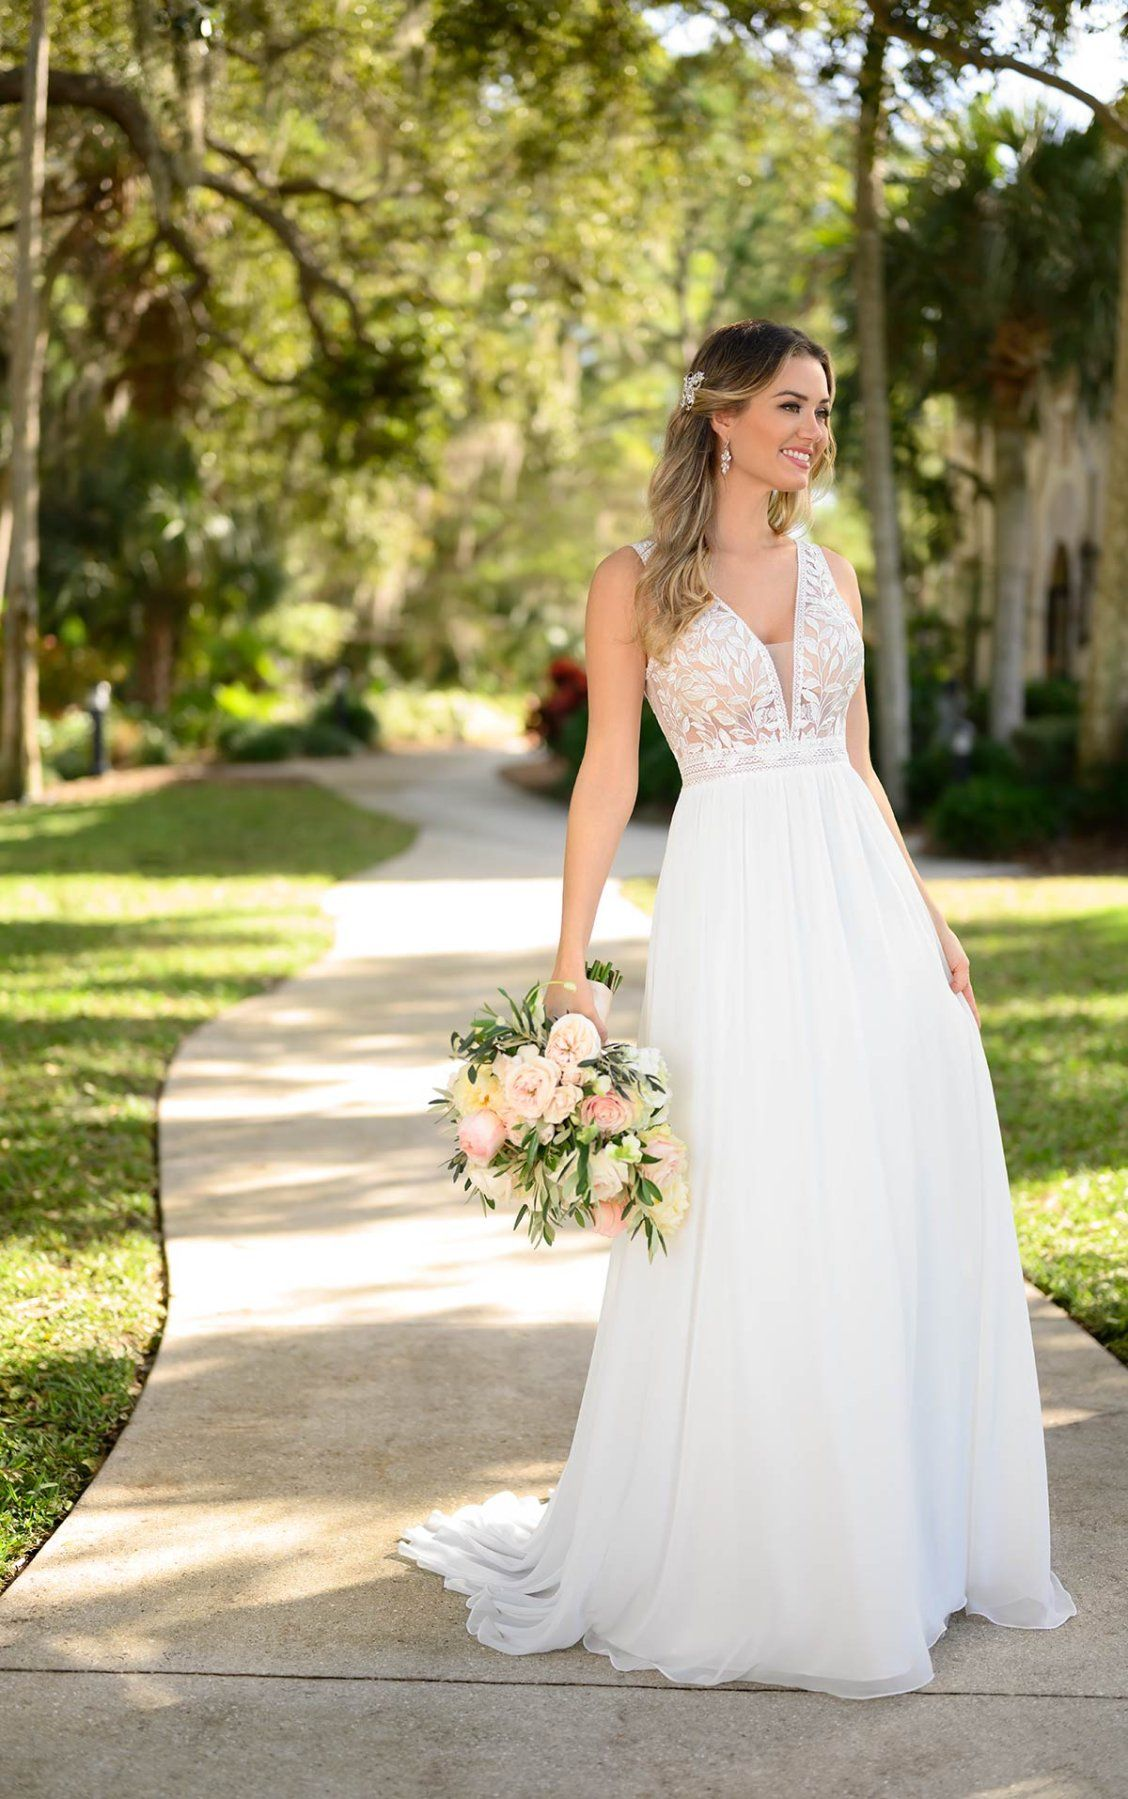 Clean Boho Inspired Wedding Gown Stella York Wedding Dresses In 2021 Wedding Dresses Stella York Wedding Dress Ball Gown Wedding Dress [ 1799 x 1128 Pixel ]